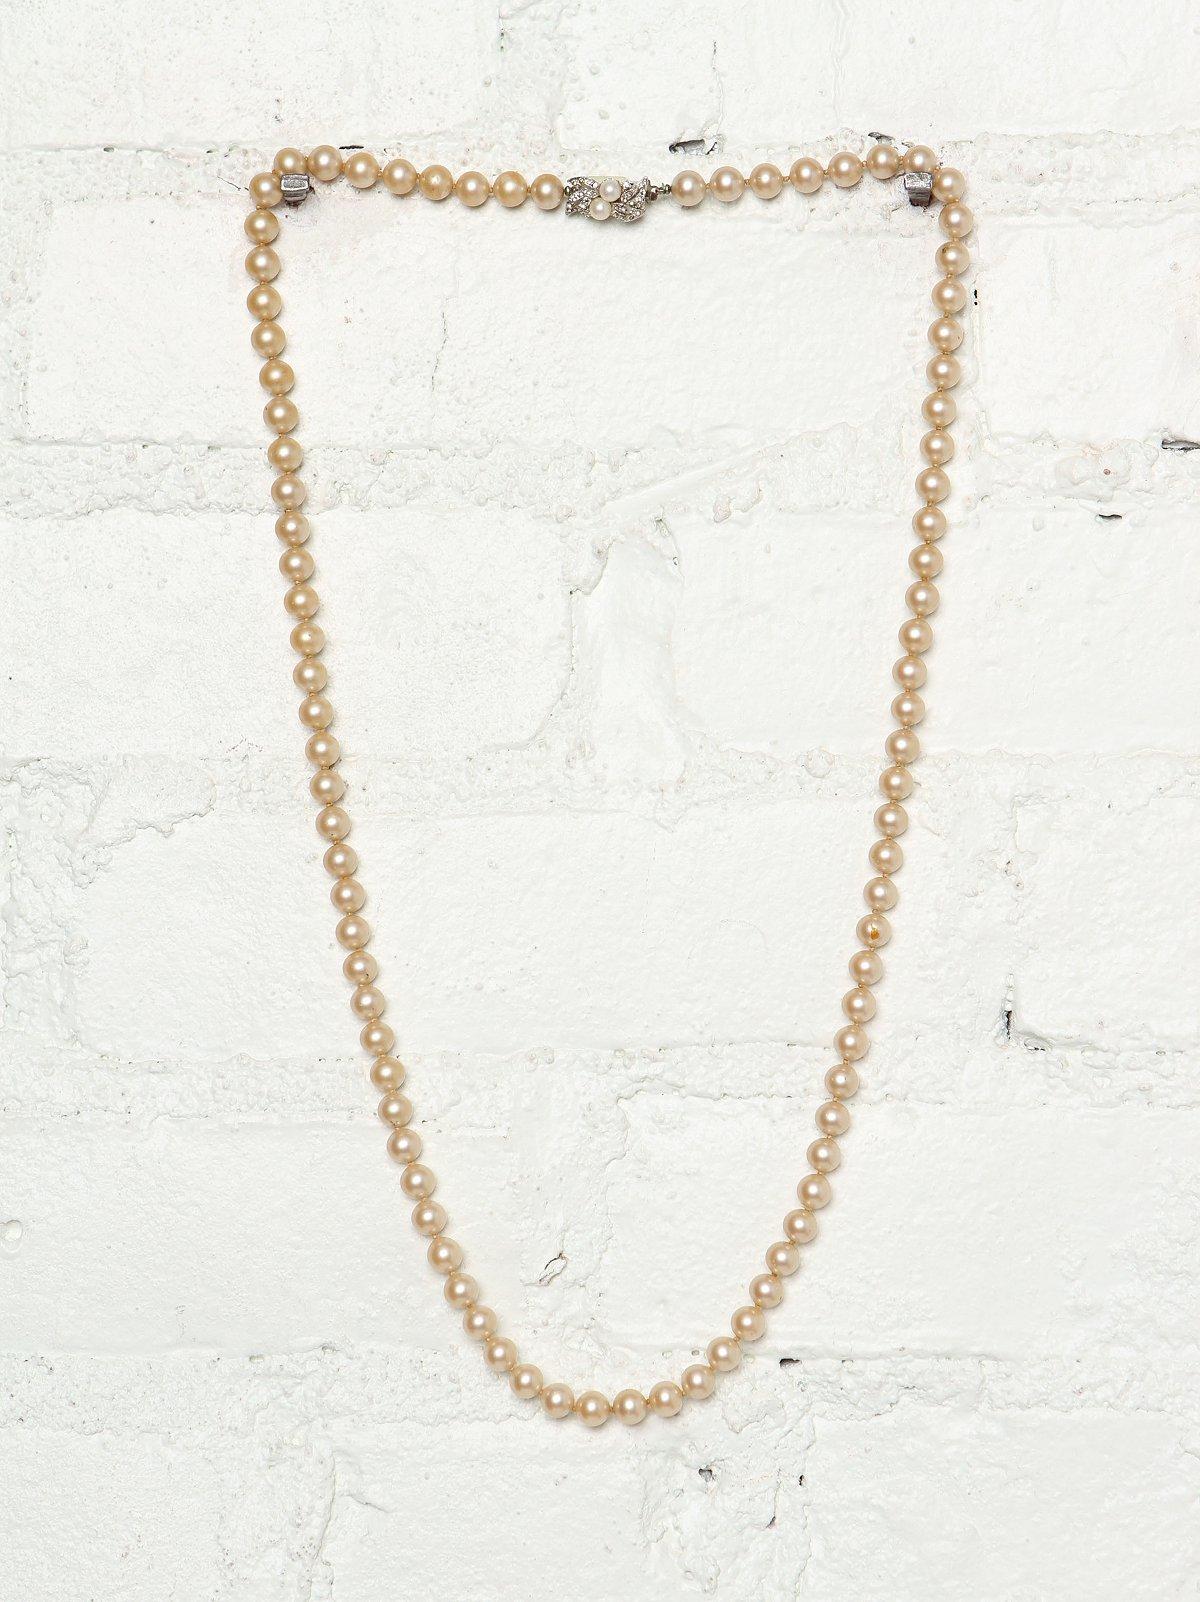 Vintage Double Wrap Pearl Necklace